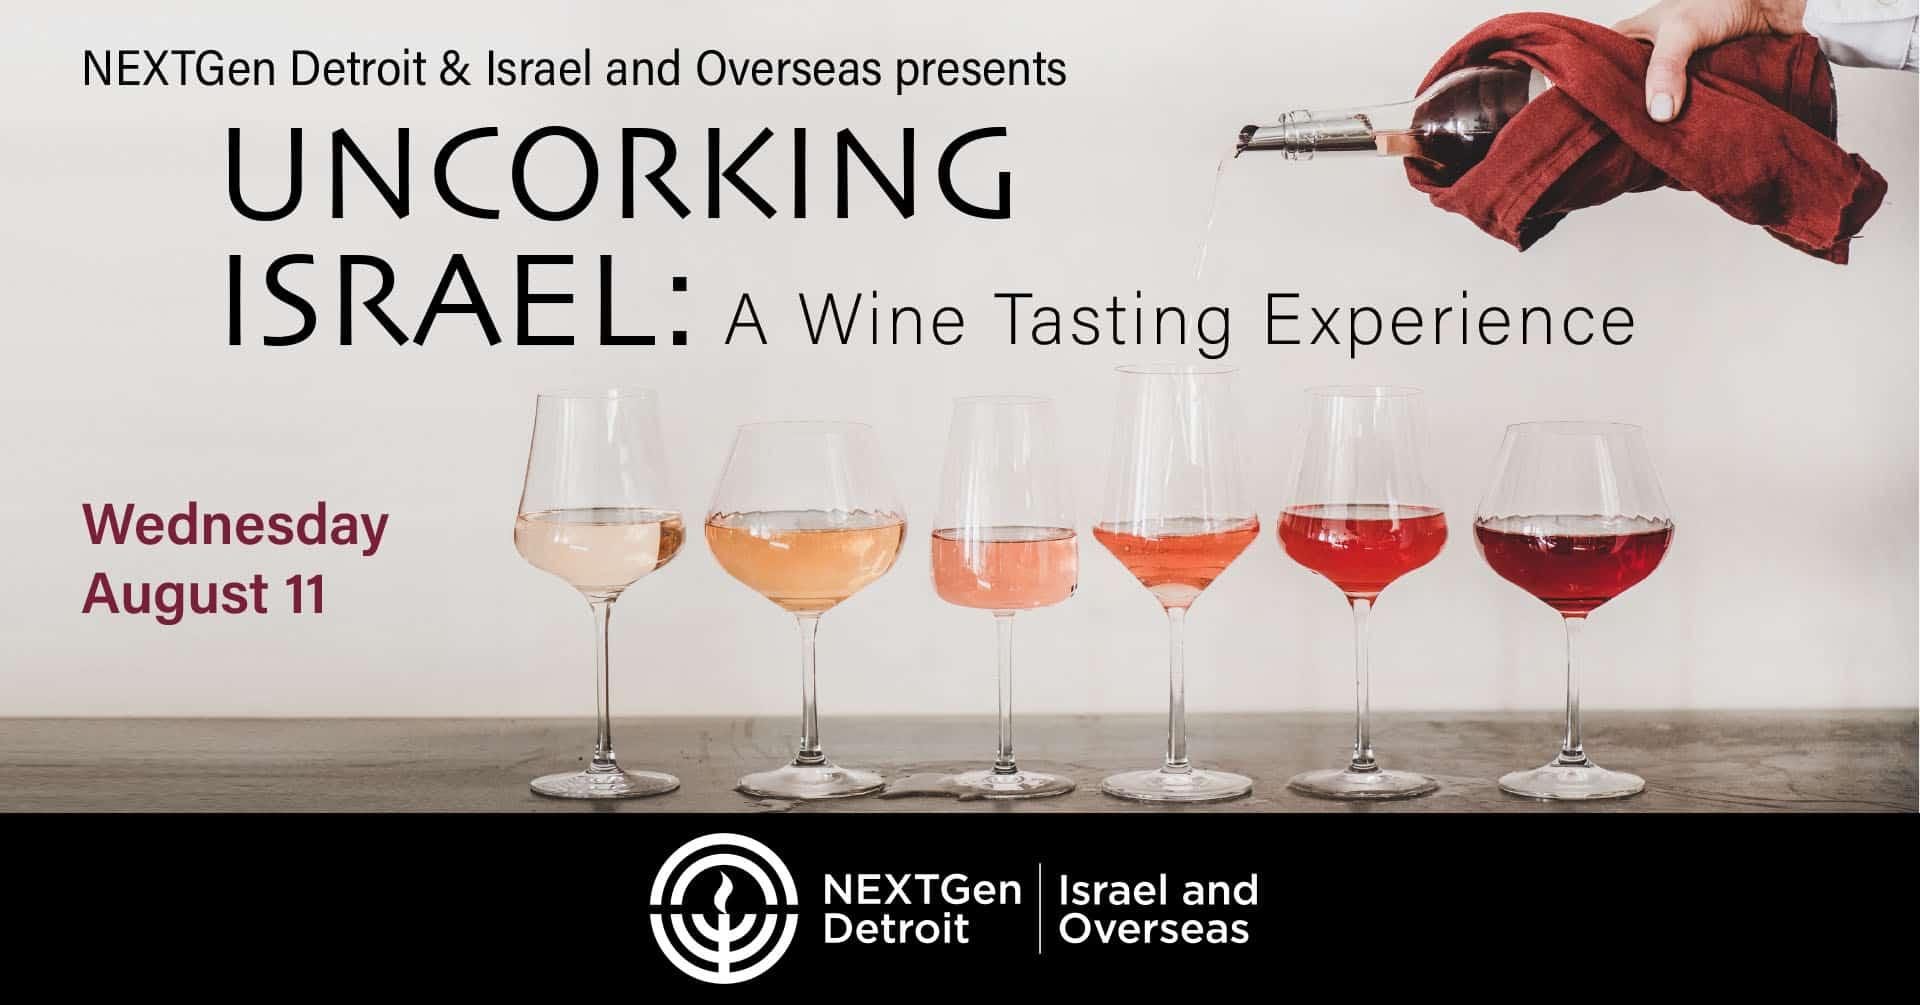 Uncorking Israel: A Wine Tasting Experience